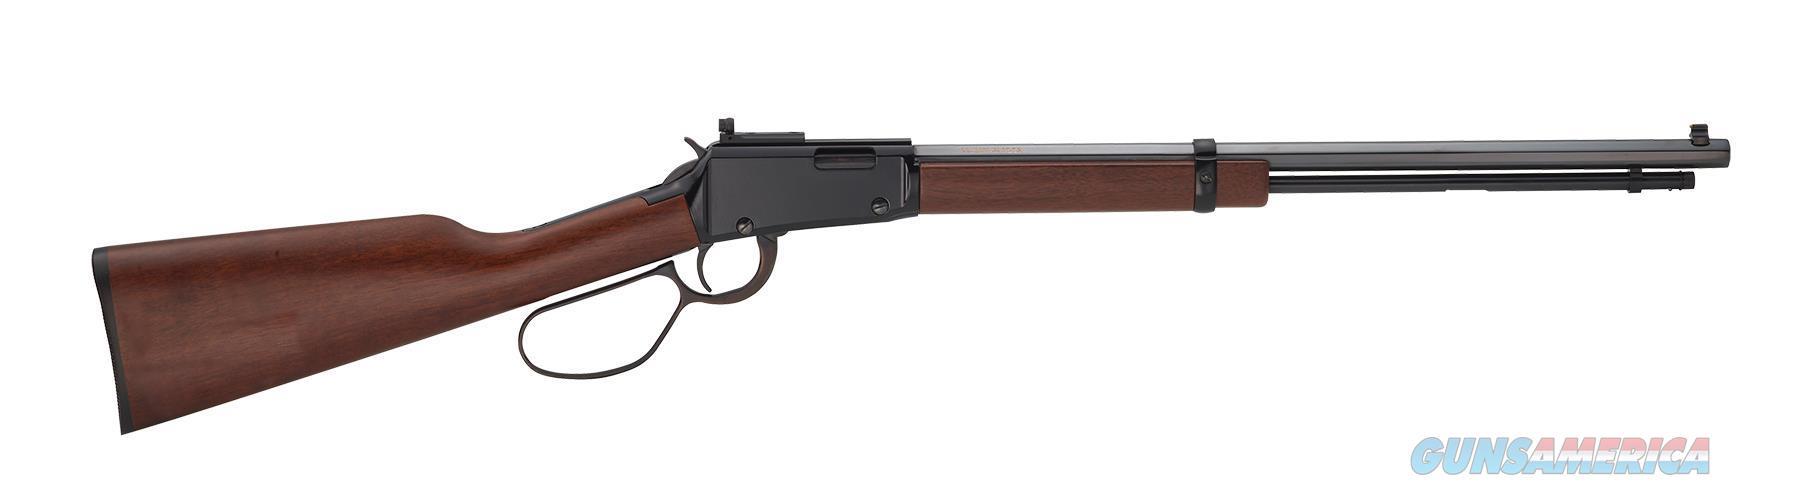 "Henry H001tlp Small Game Carbine  Lever 22 Short/Long/Long Rifle 17"" 12 Lr/16 Short American Walnut Stk Blued H001TLP  Guns > Rifles > H Misc Rifles"